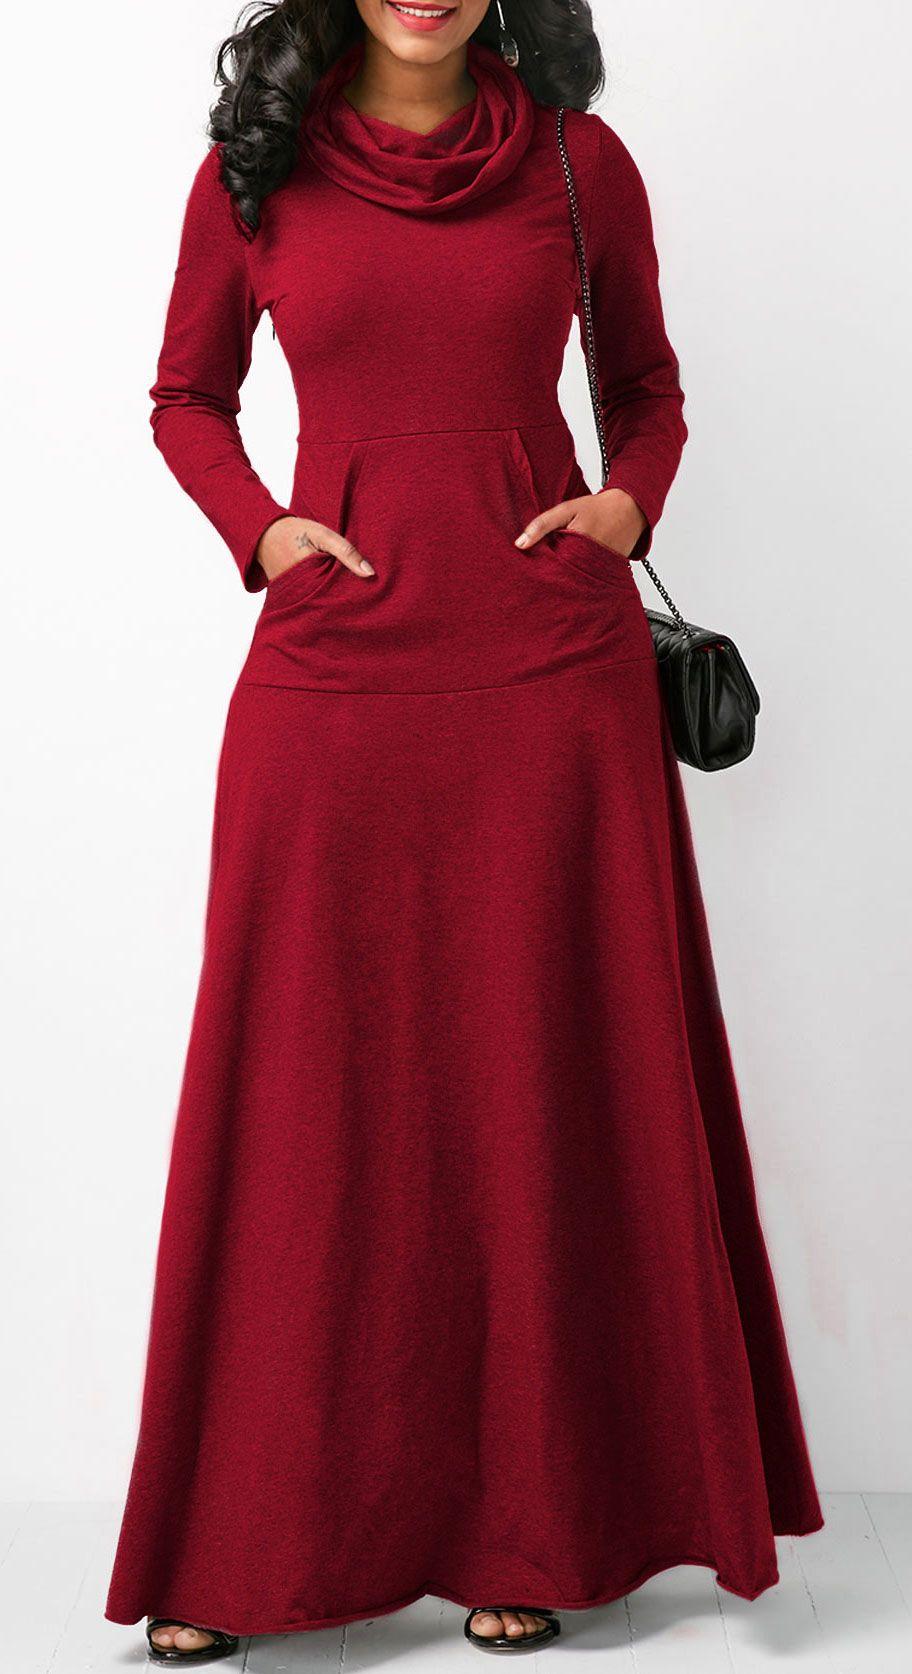 Cowl neck wine red long sleeve maxi dress long sleeve maxi cowl